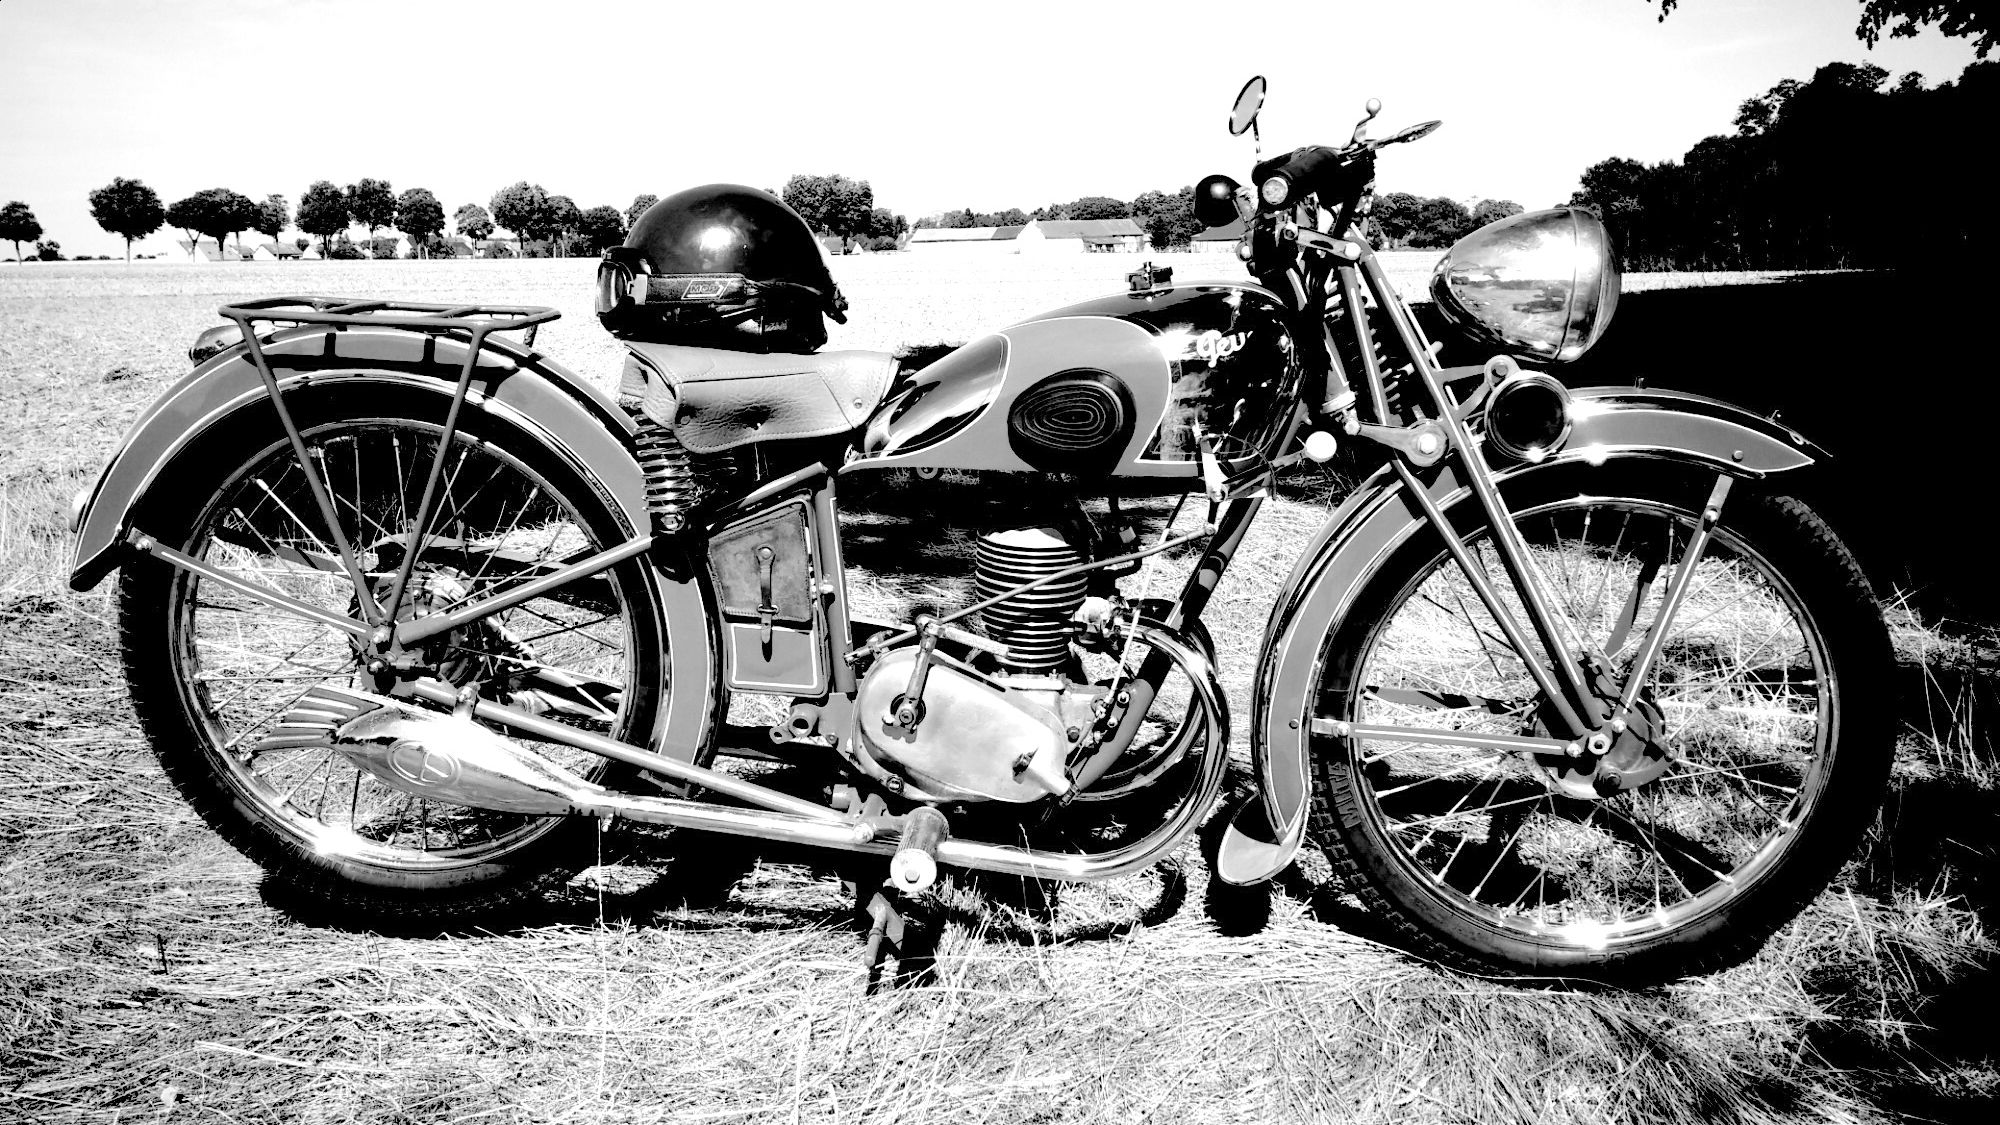 Épinglé par Nikos sur Ό,τι θέλω να αγοράσω | Motos, 125cc